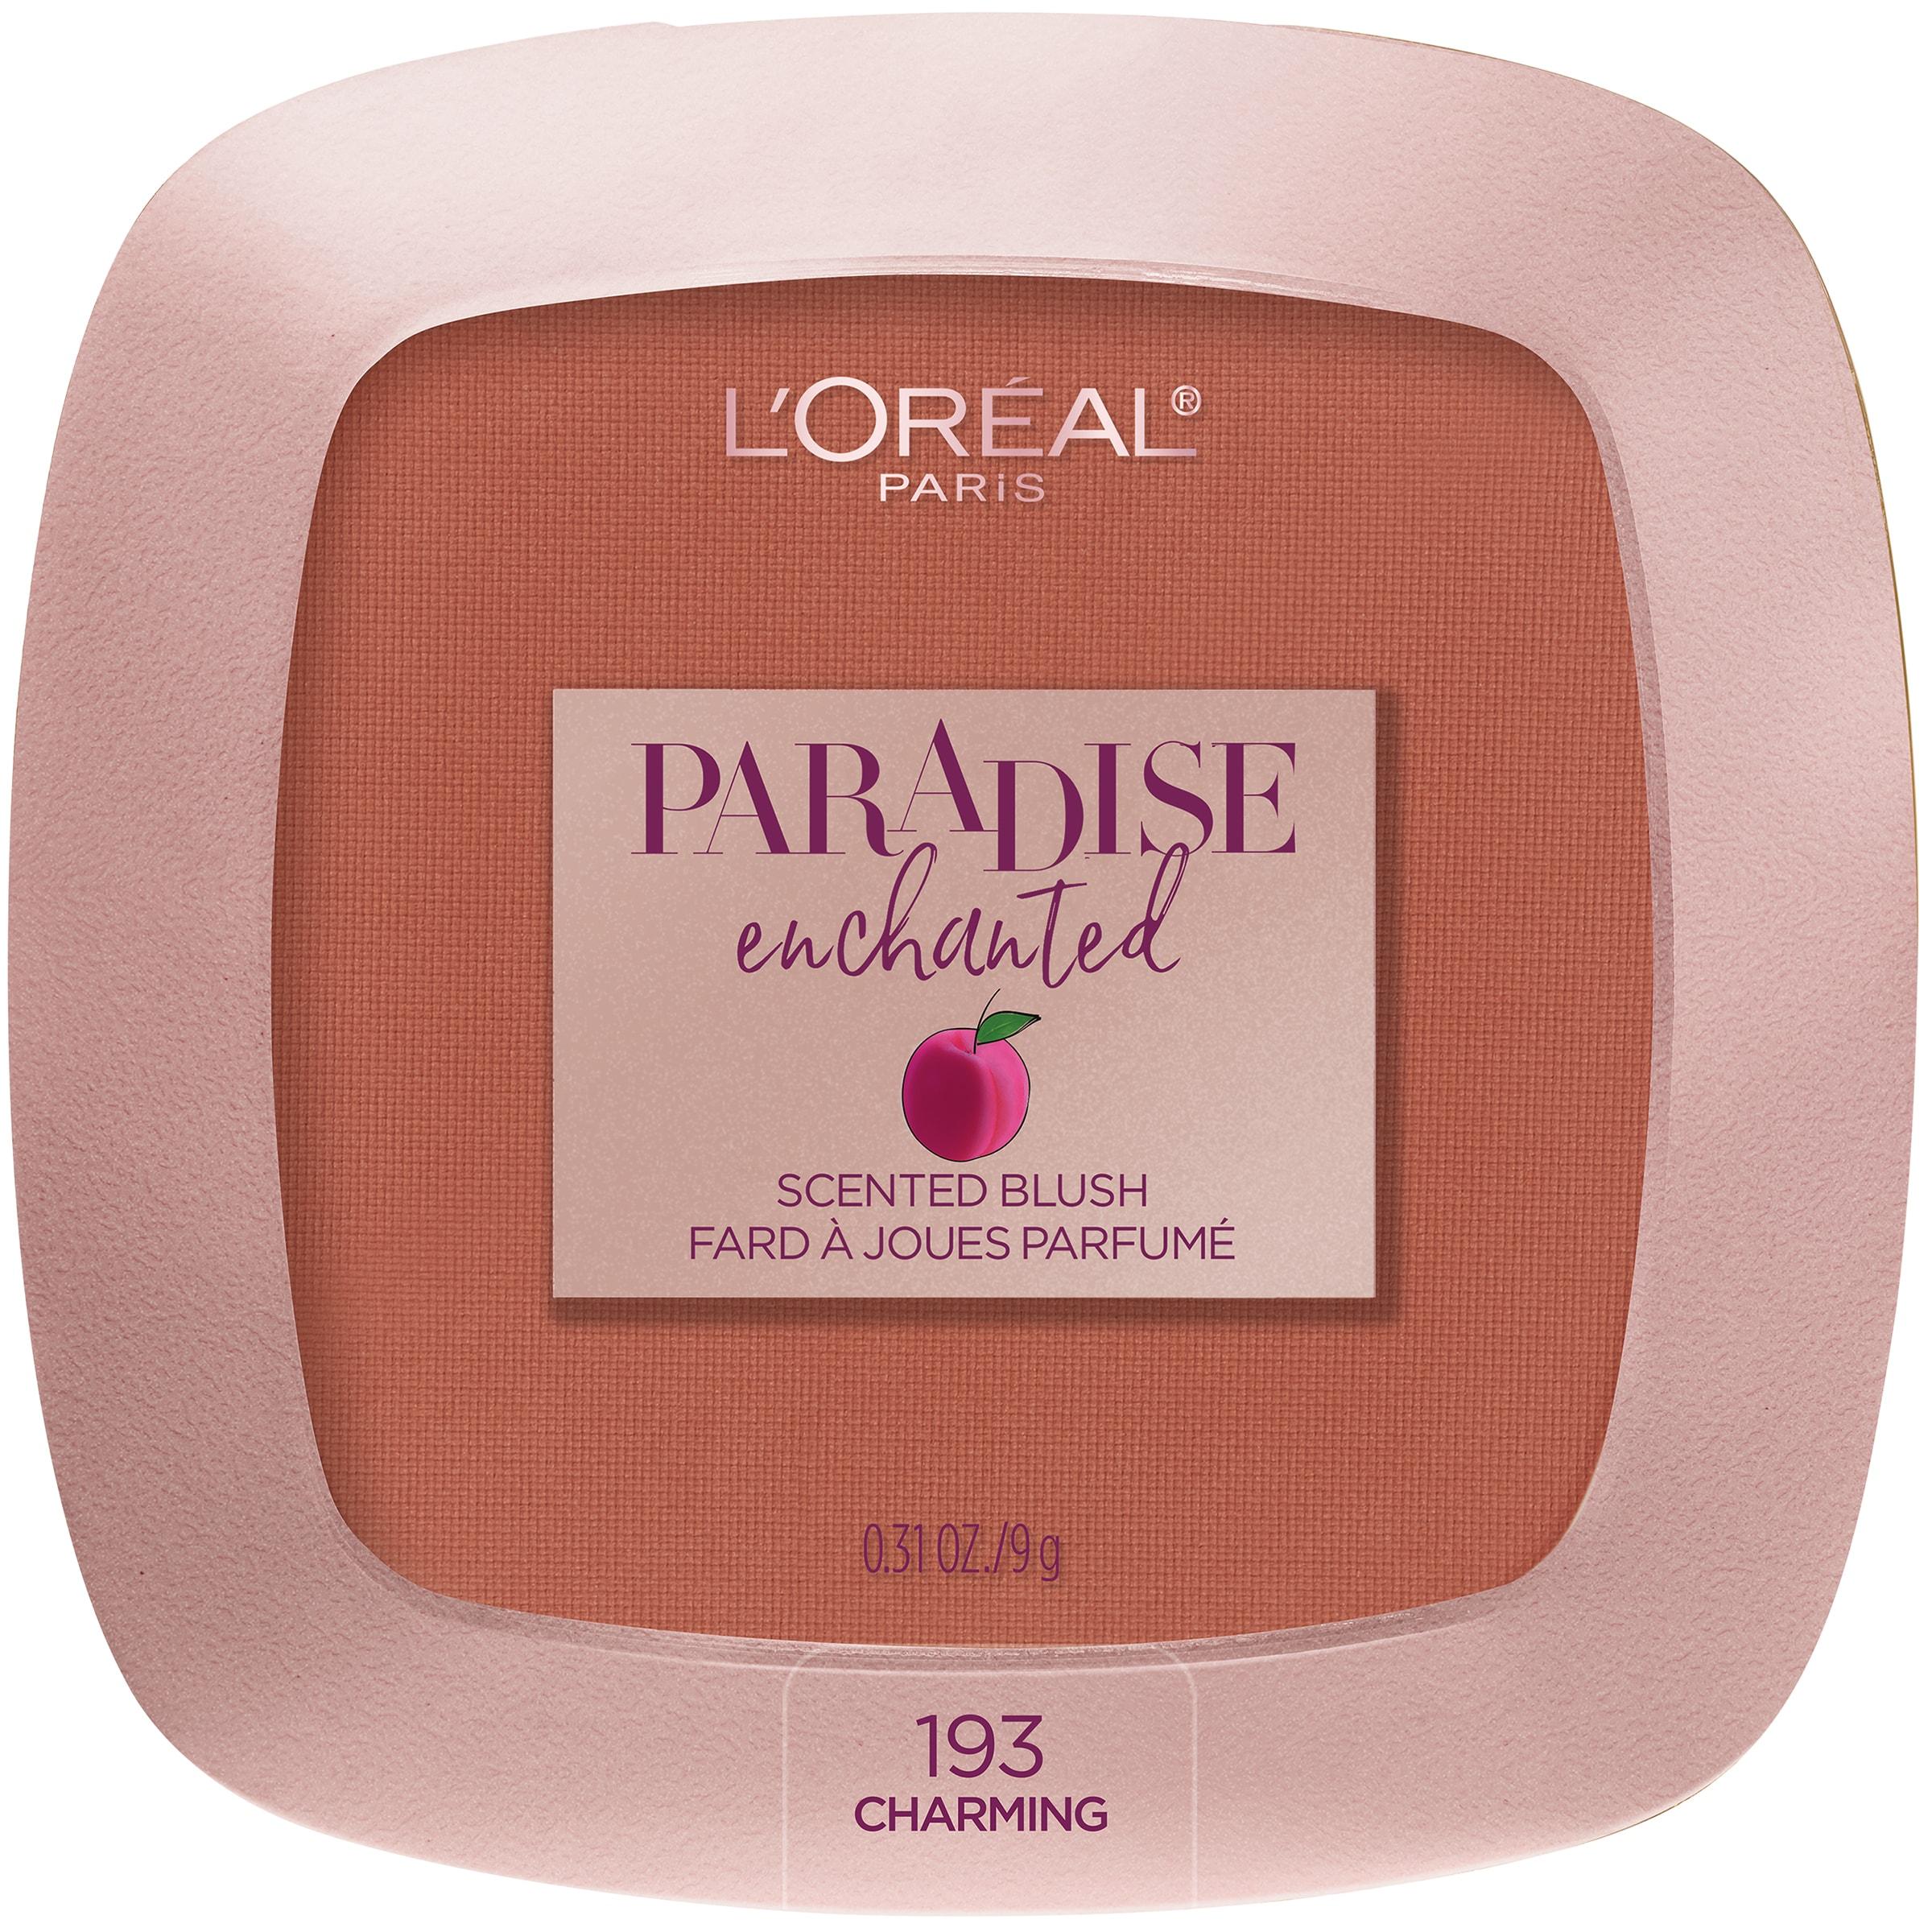 L'Oreal Paris Paradise Enchanted Fruit-Scented Blush Makeup, Charming